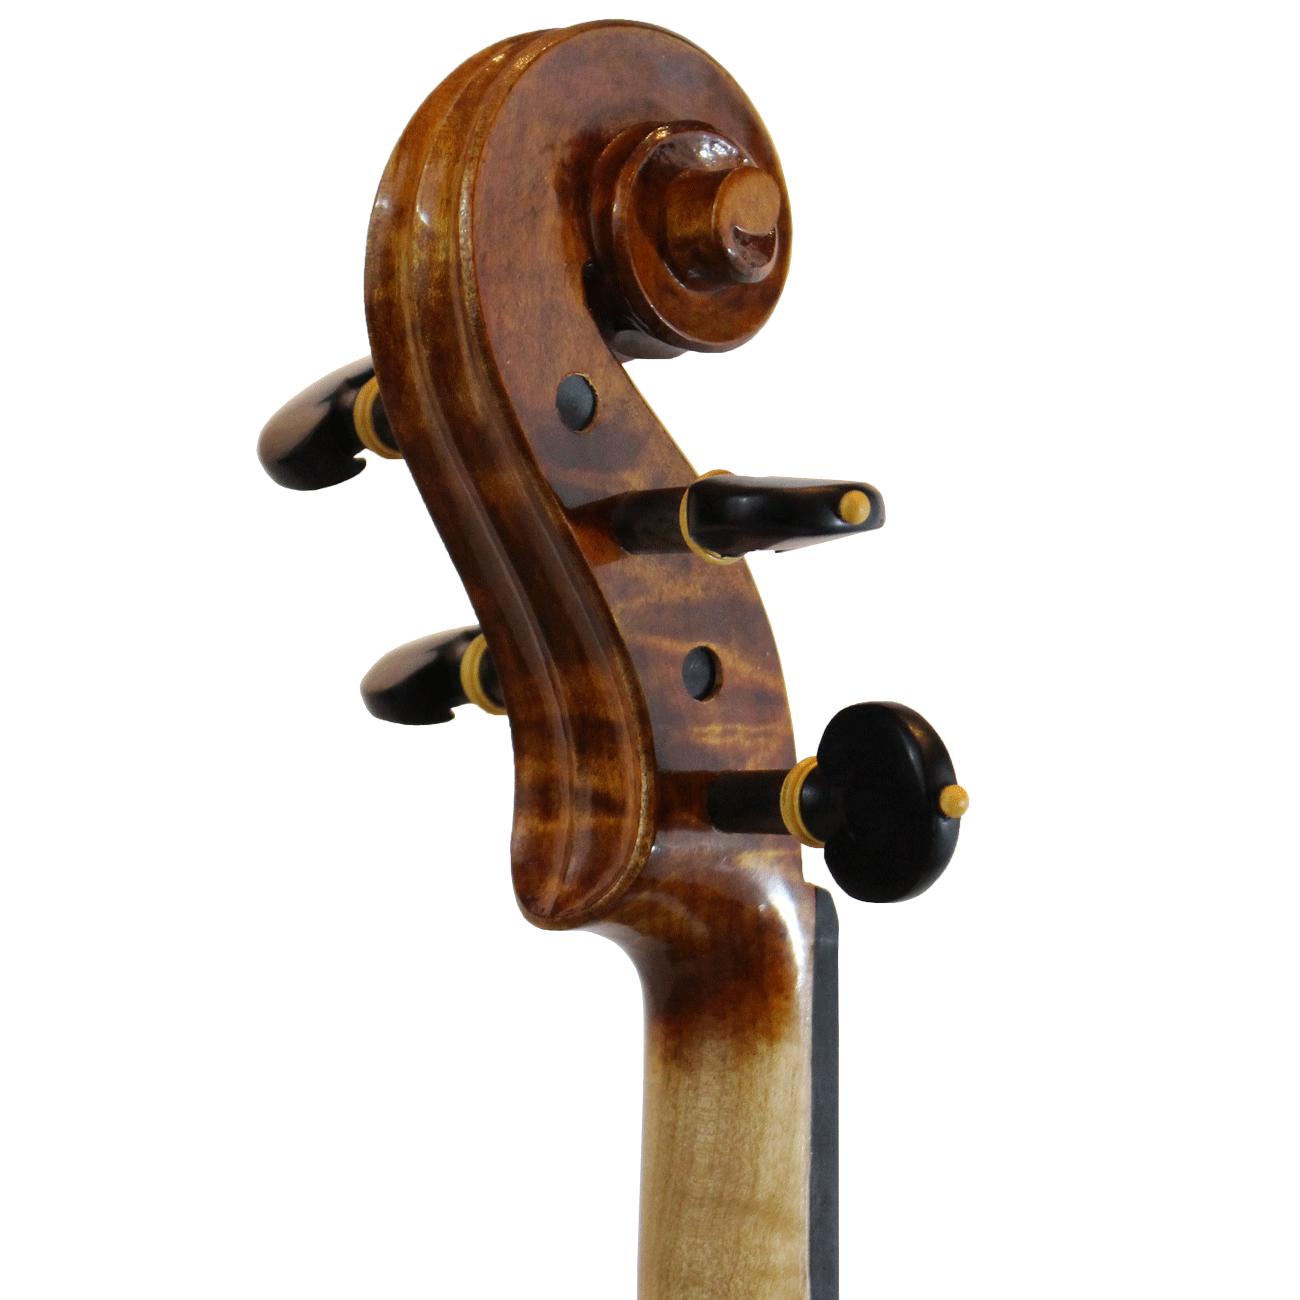 Violino Artesanal Atelier Oliver Goma Laca 4/4